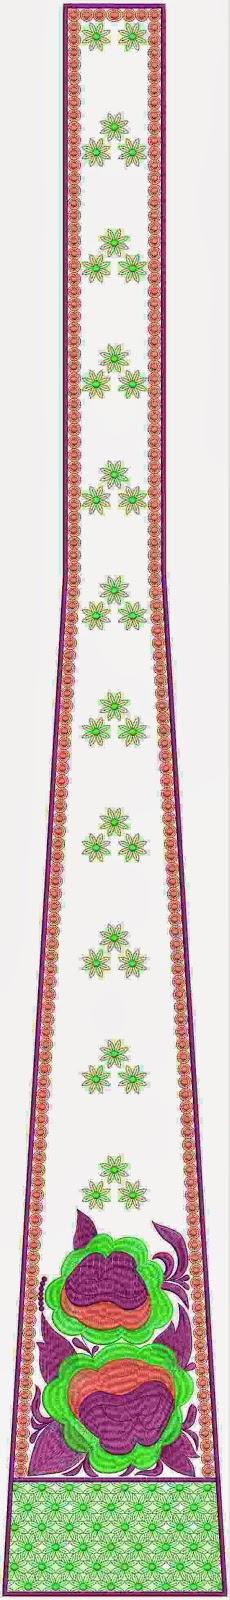 Ottomaanse klere mode veelkleurige kali appliekwerk